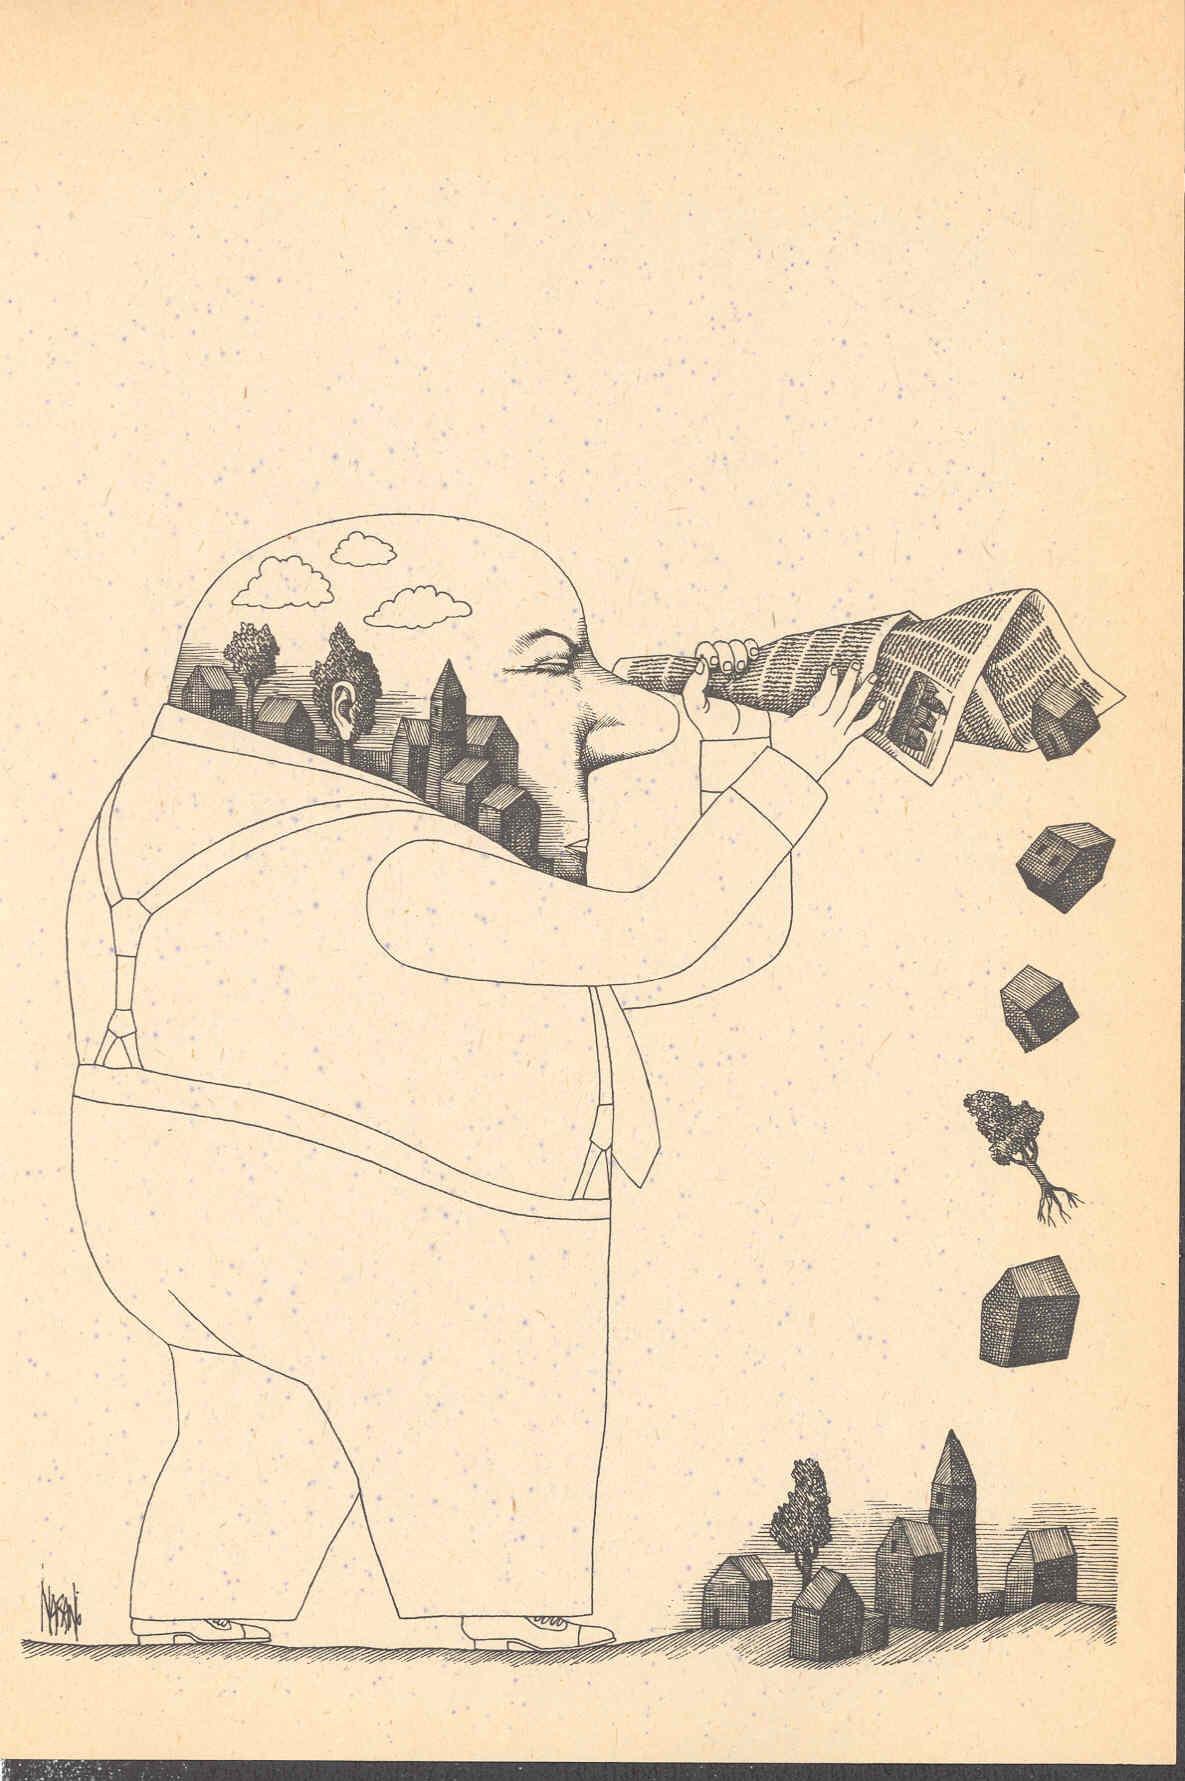 mindsigh: Rogelio Naranjo, unknown